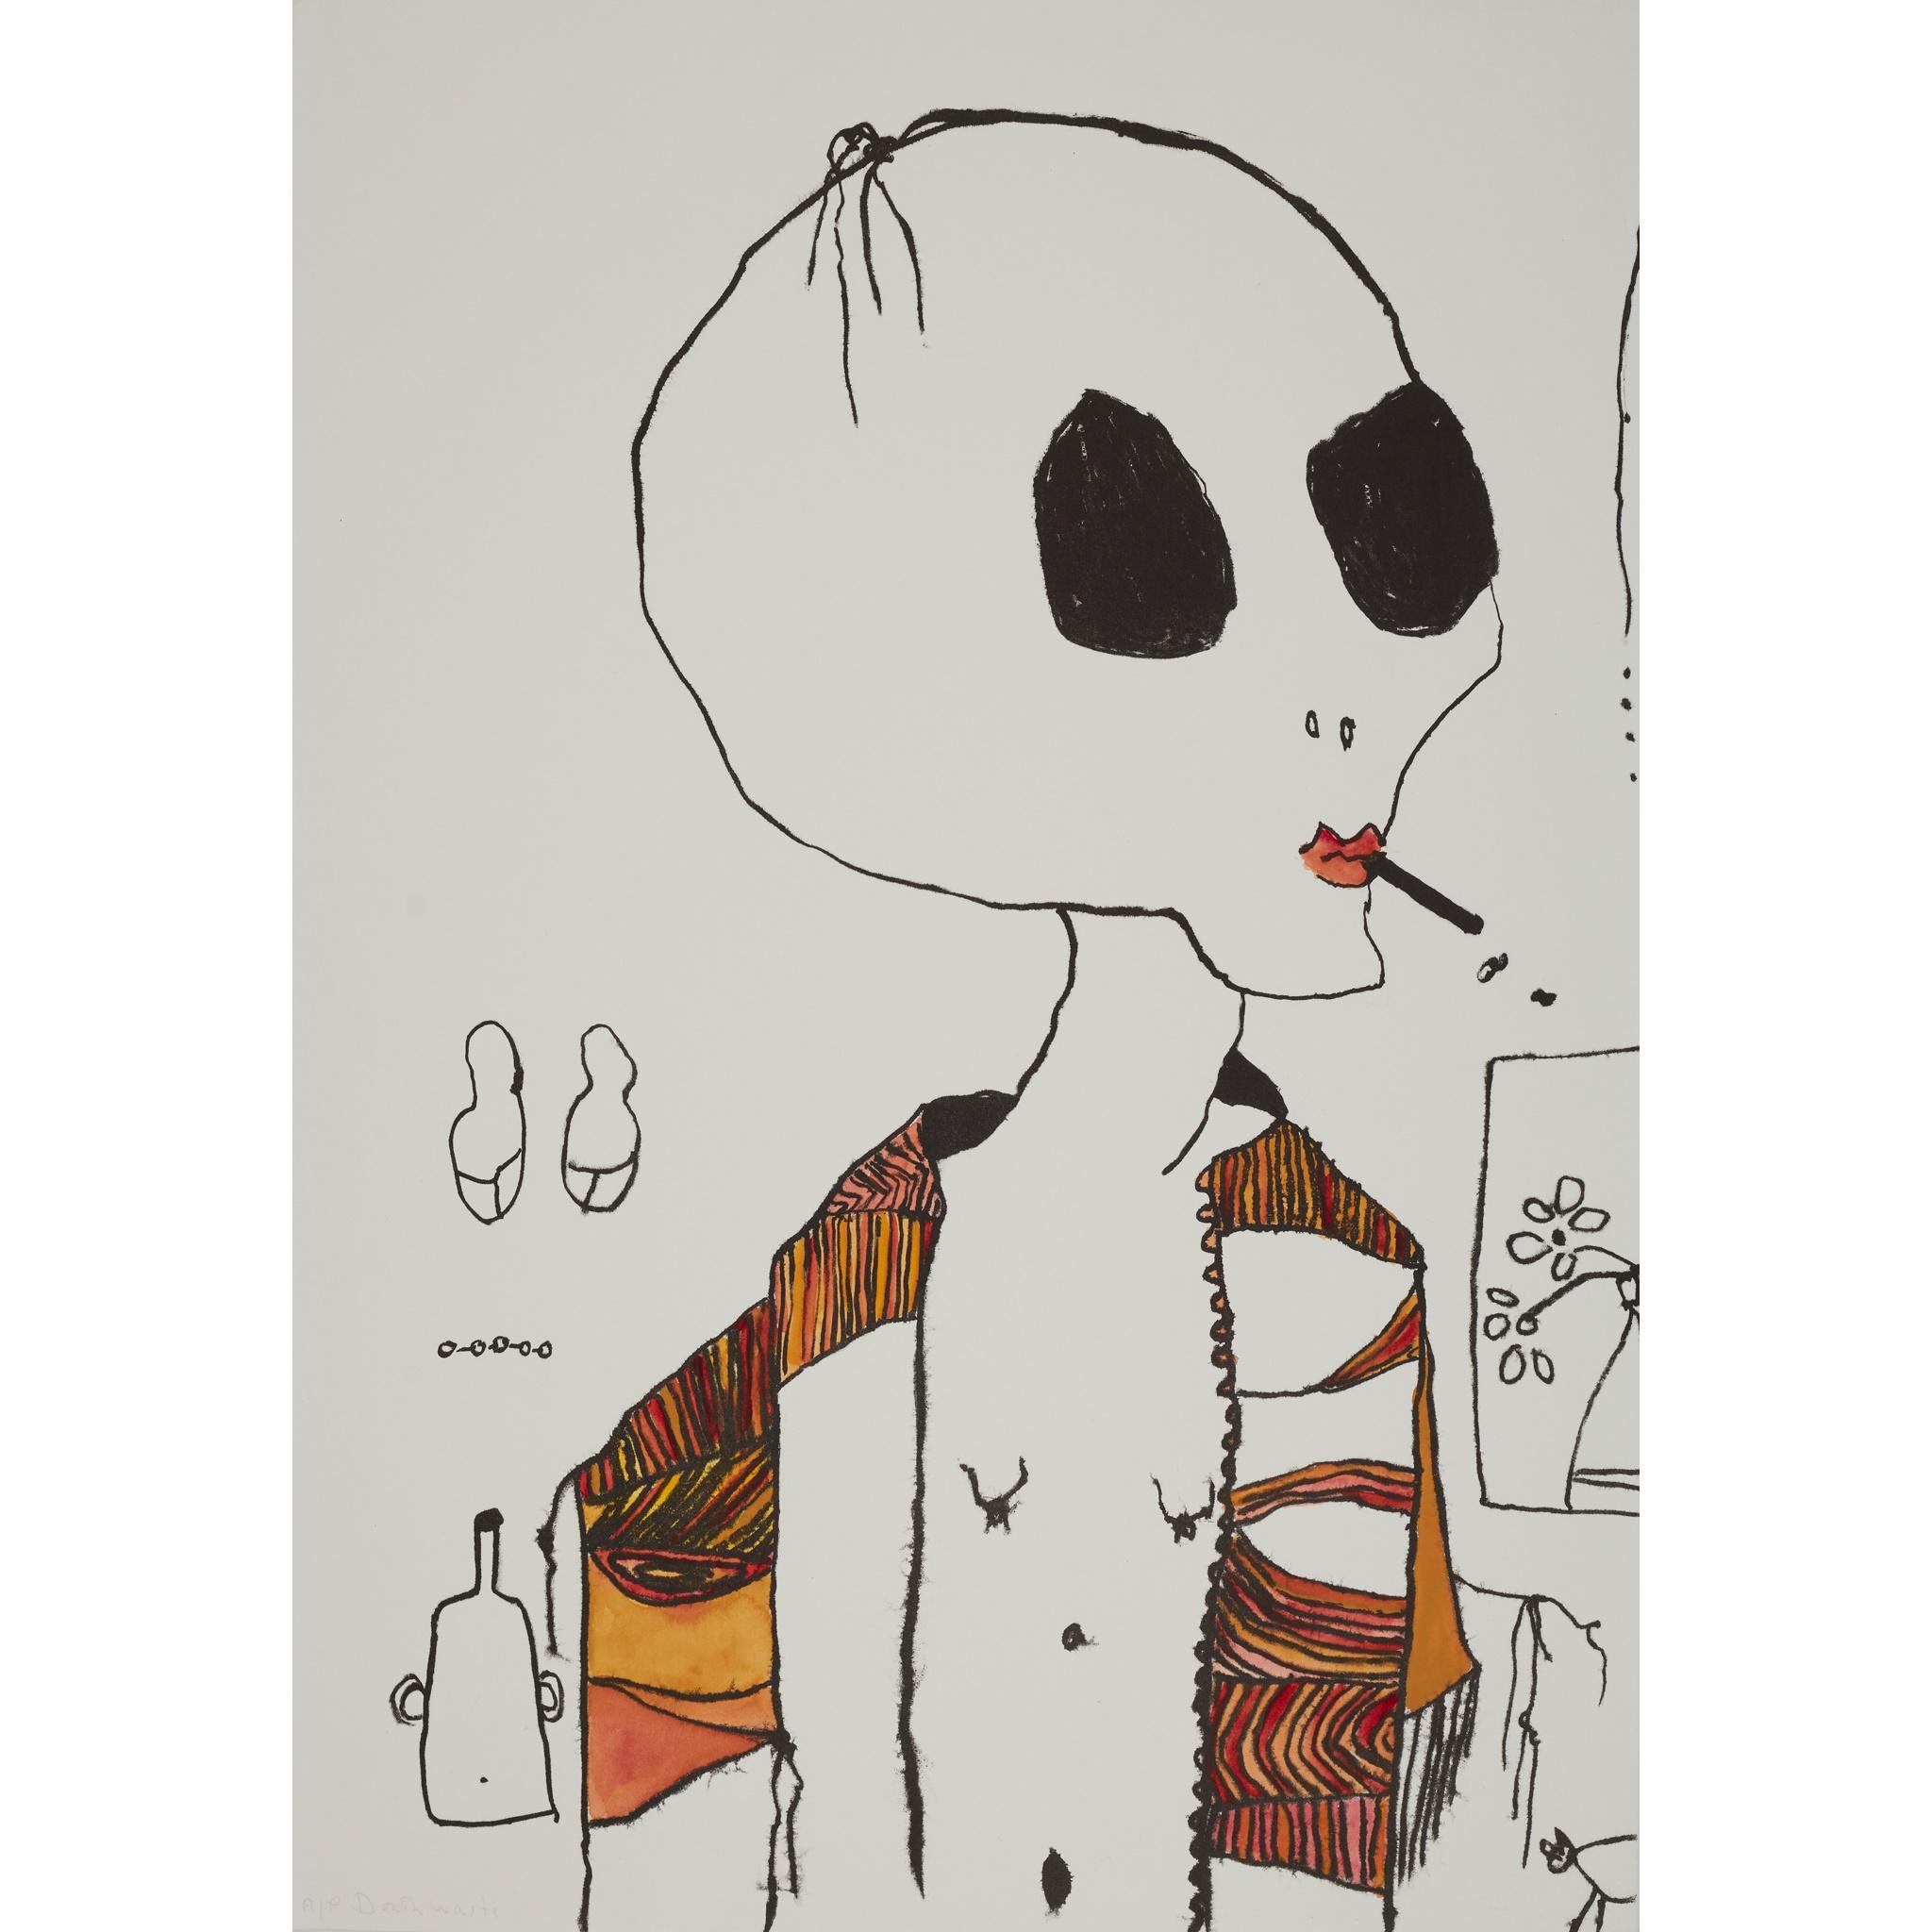 § PATRICIA DOUTHWAITE (SCOTTISH 1939-2002) SMOKER